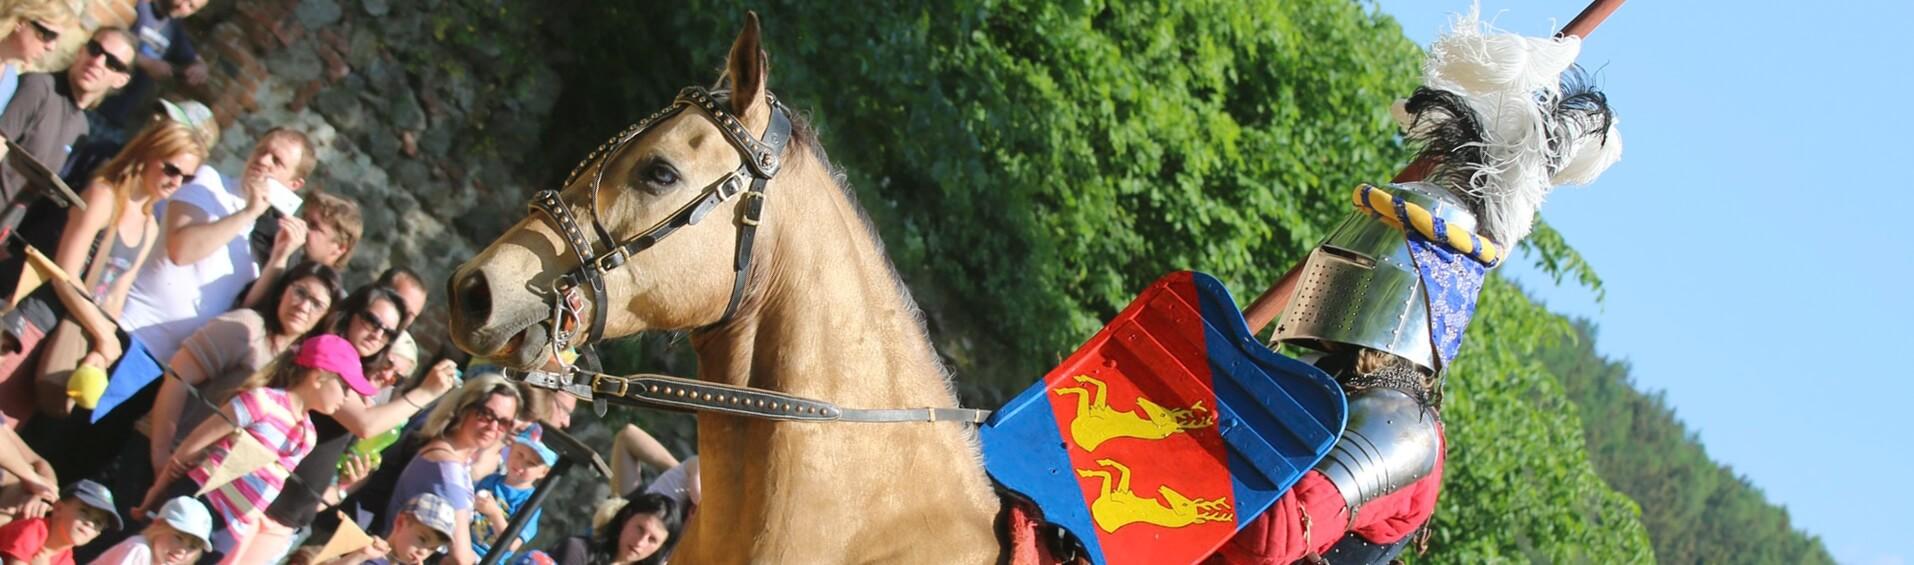 Koňské turnaje